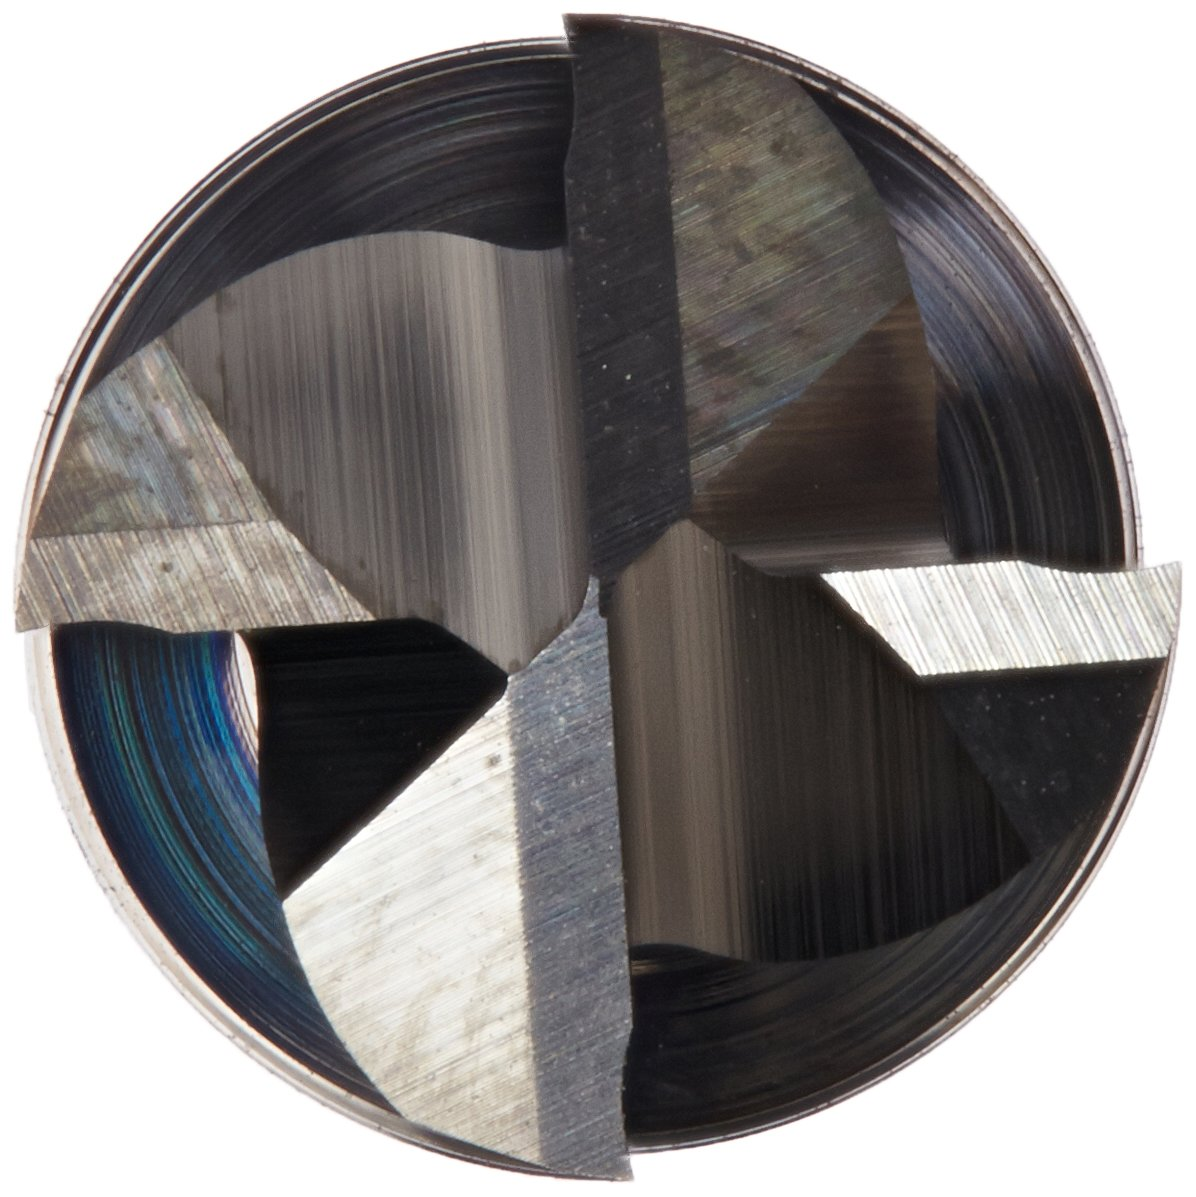 Kodiak Cutting Tools KCT136497 USA Made Solid Premium Carbide End Mill Long 3//8 Shank 3 Overall Length 3//8 Diameter 1-1//8 Length of Cut 4 Flute